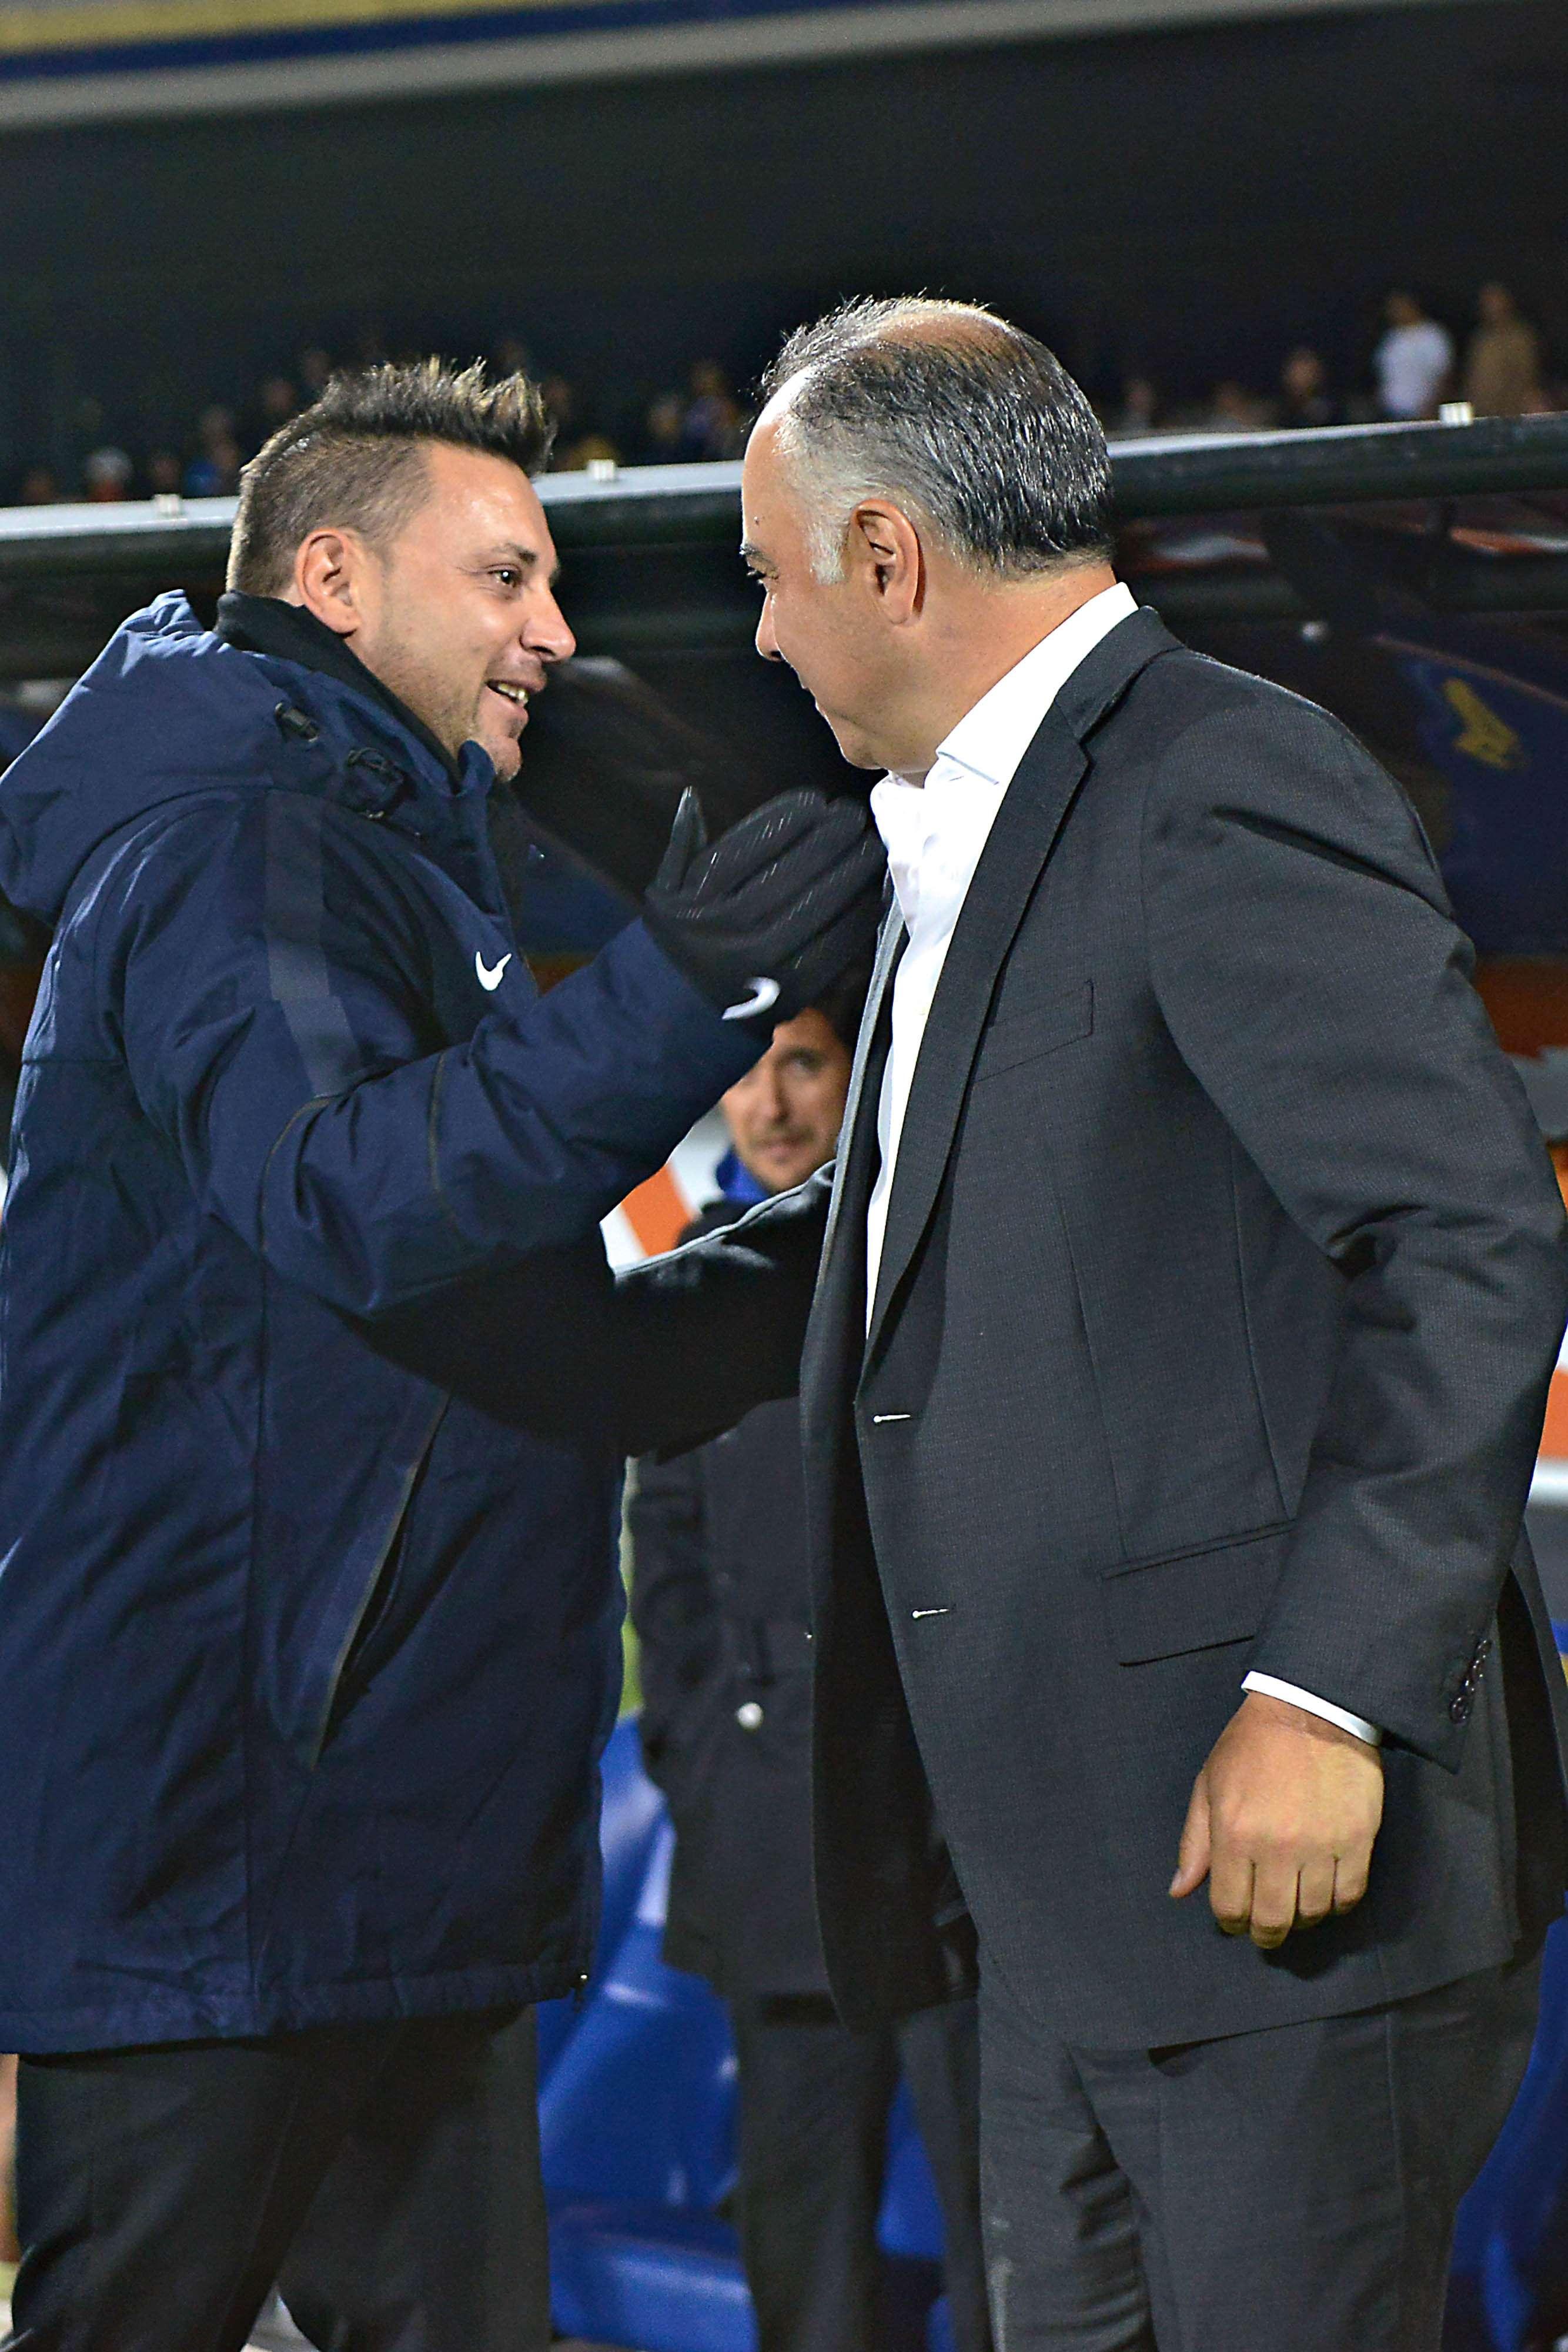 Mohamed perdió el duelo de estrategias con Guillermo Vázquez. Foto: Mexsport